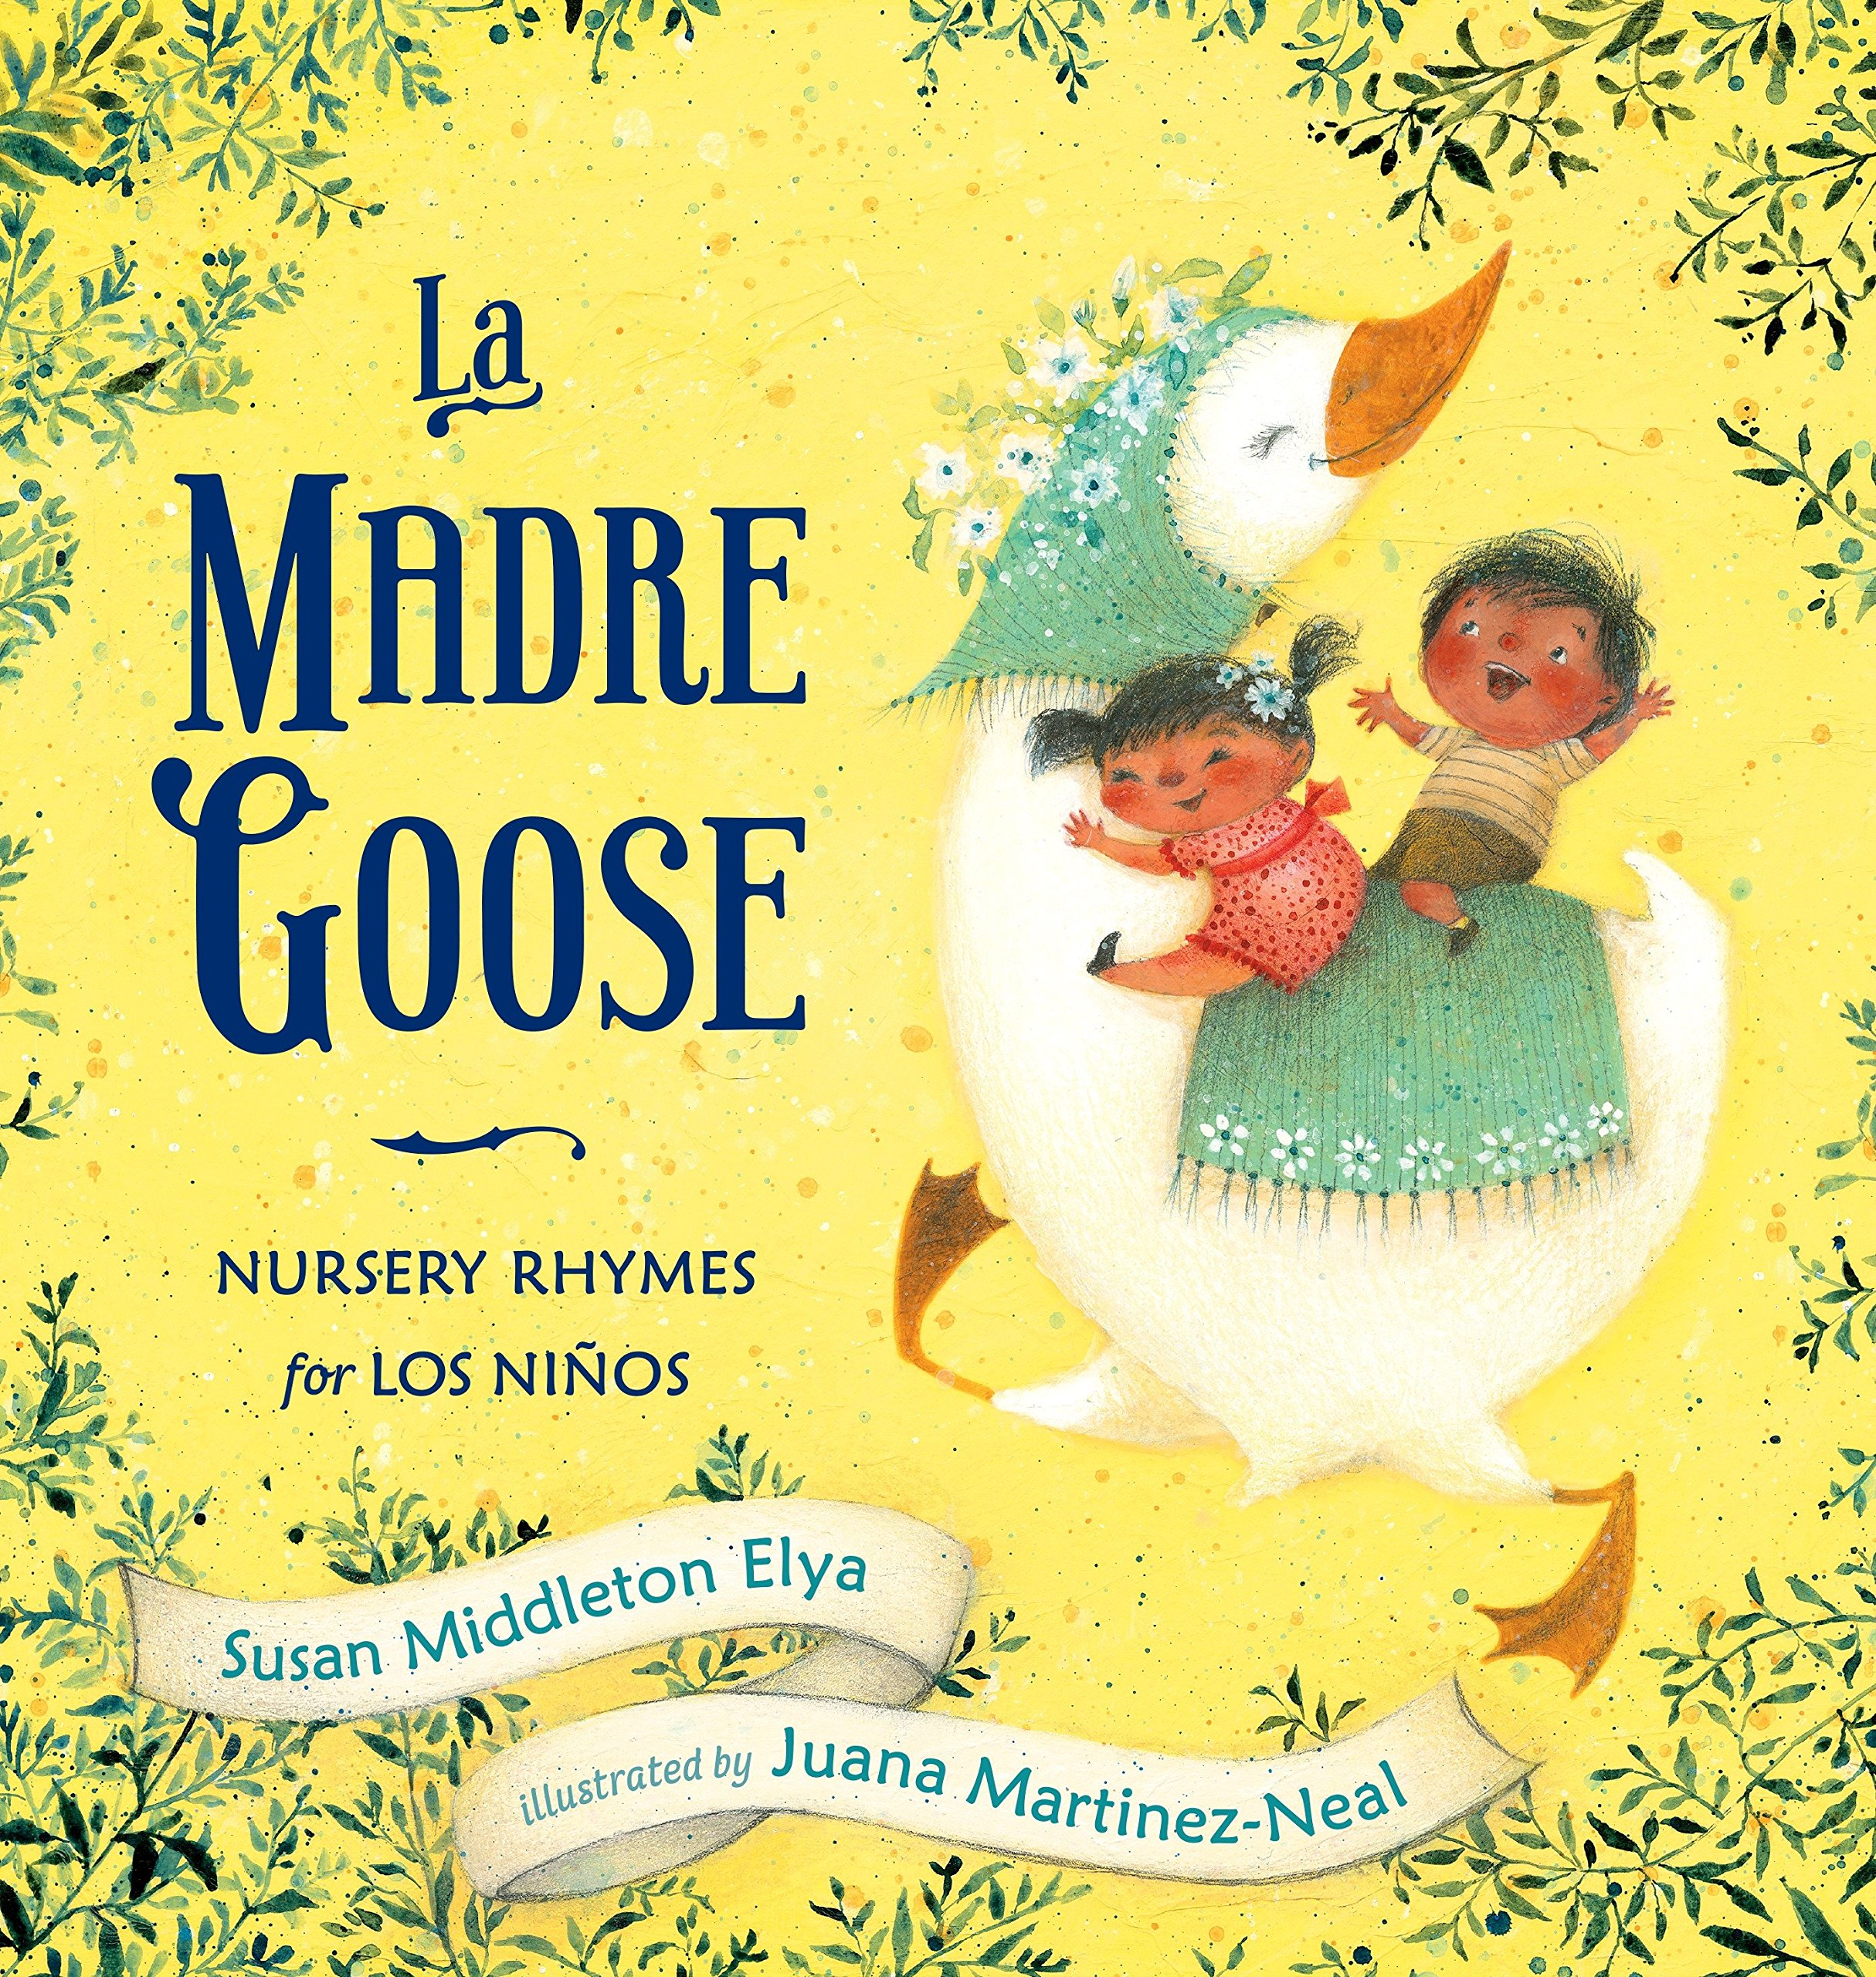 Amazon.com: La Madre Goose: Nursery Rhymes for los Niños (9780399251573): Elya, Susan Middleton, Martinez-Neal, Juana: Books